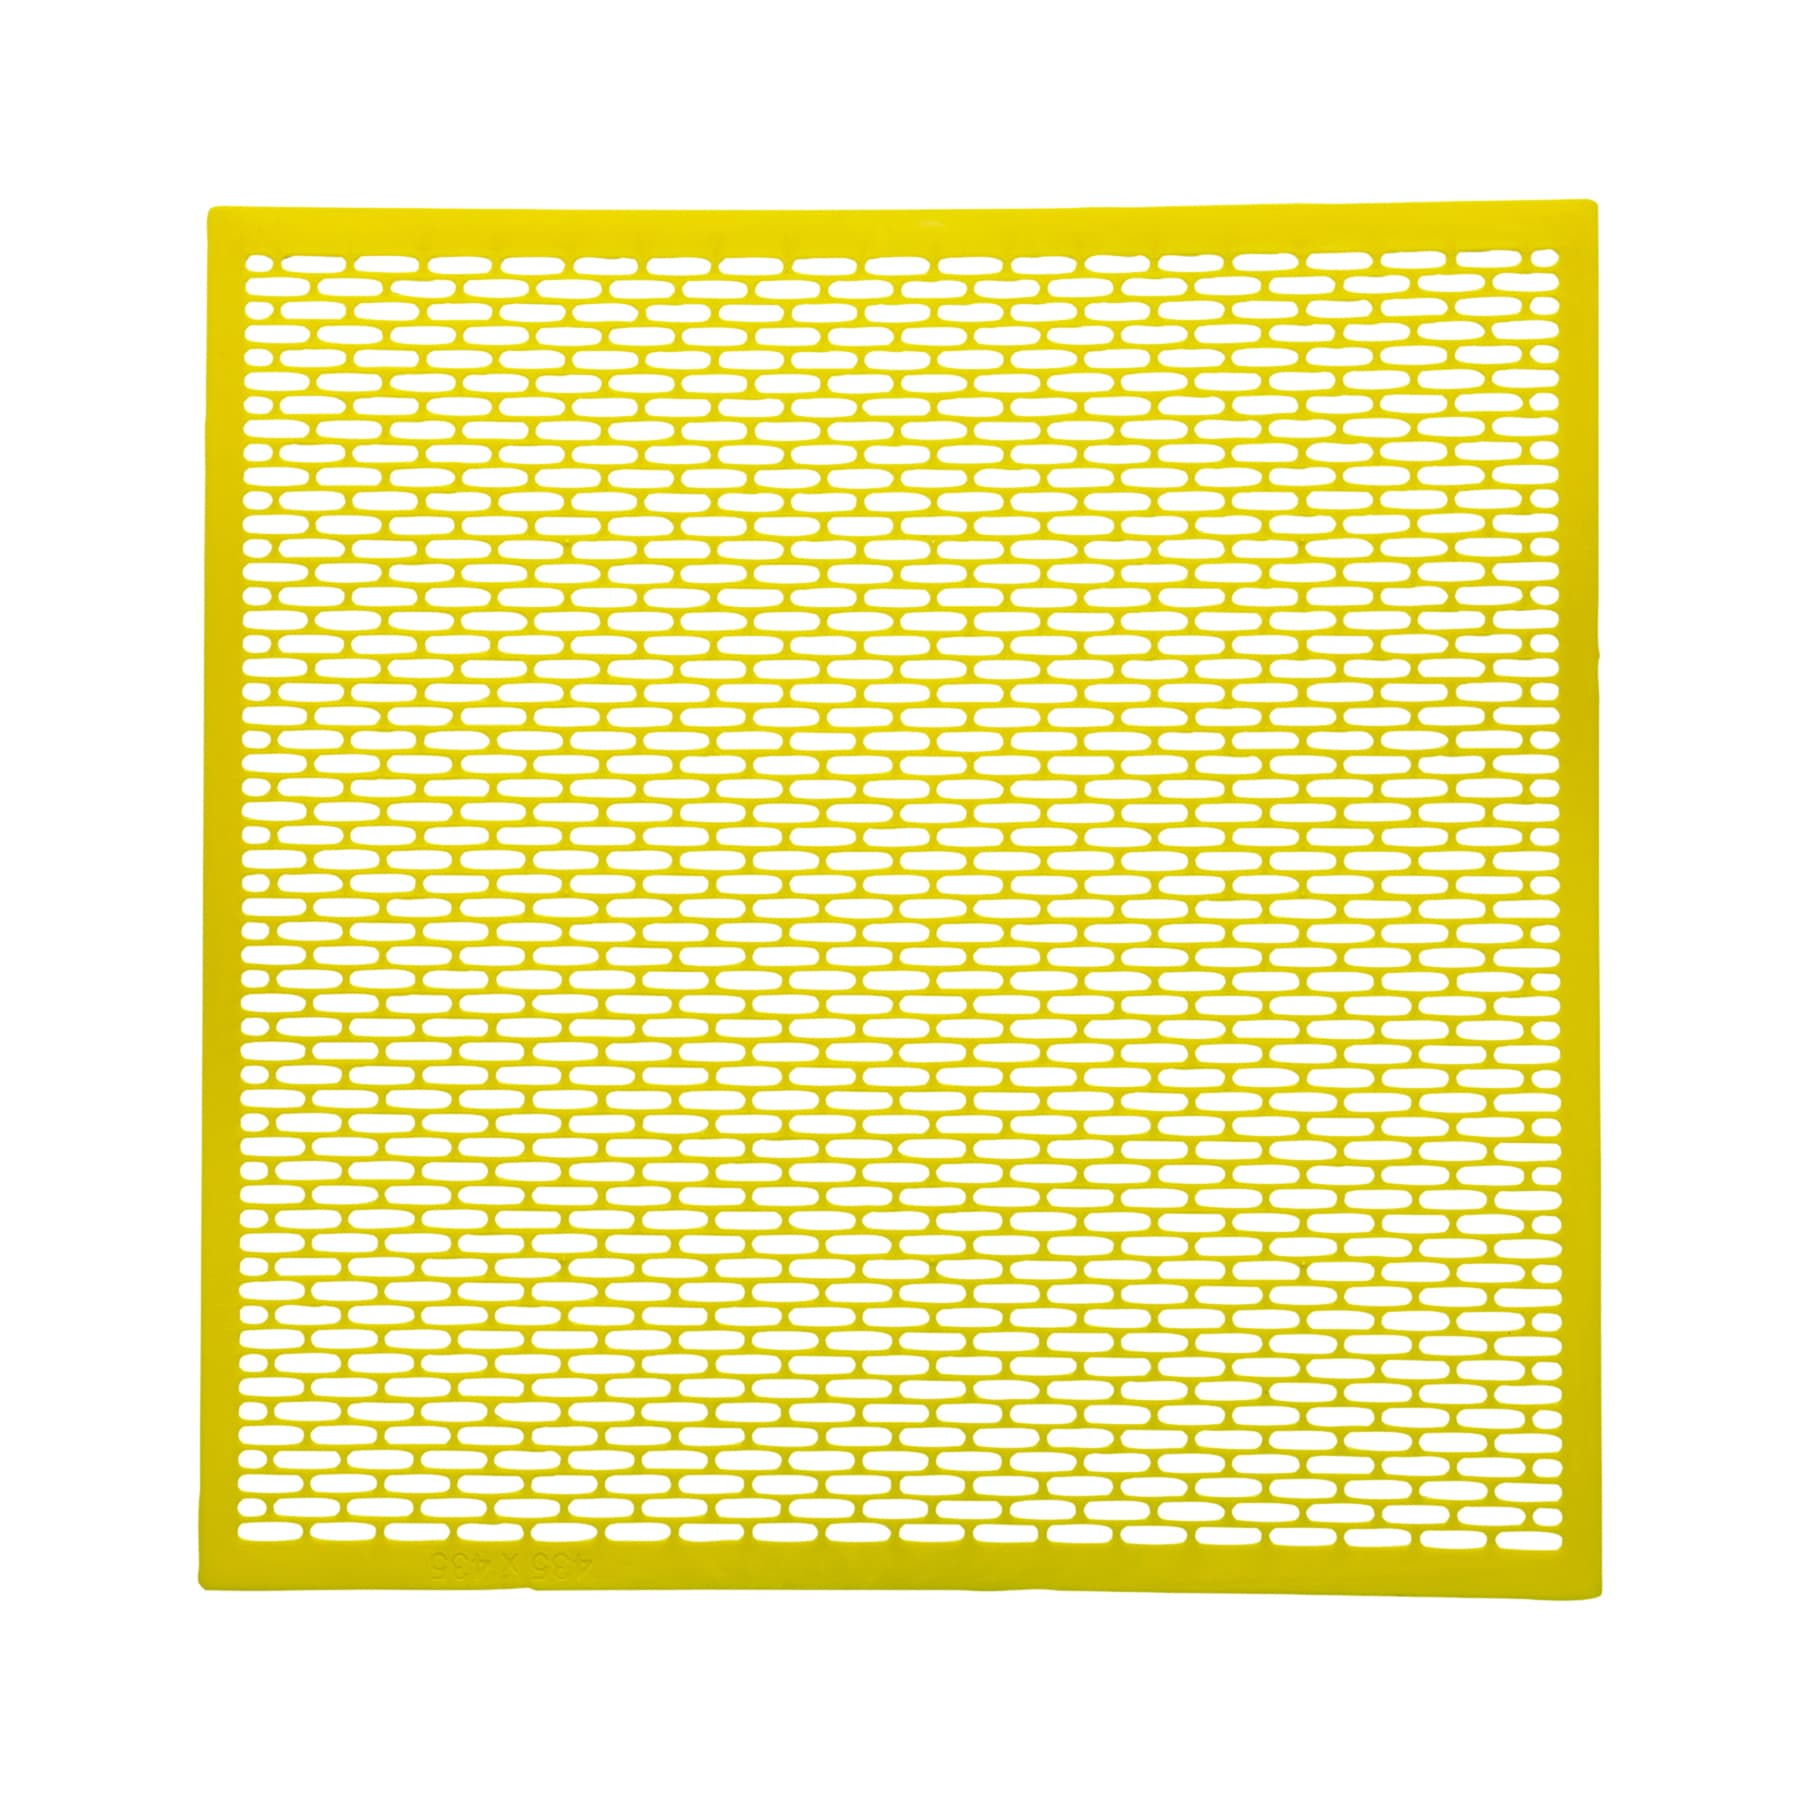 Absperrgitter Kunststoff, 500 x 500,  Dadant,  gelb